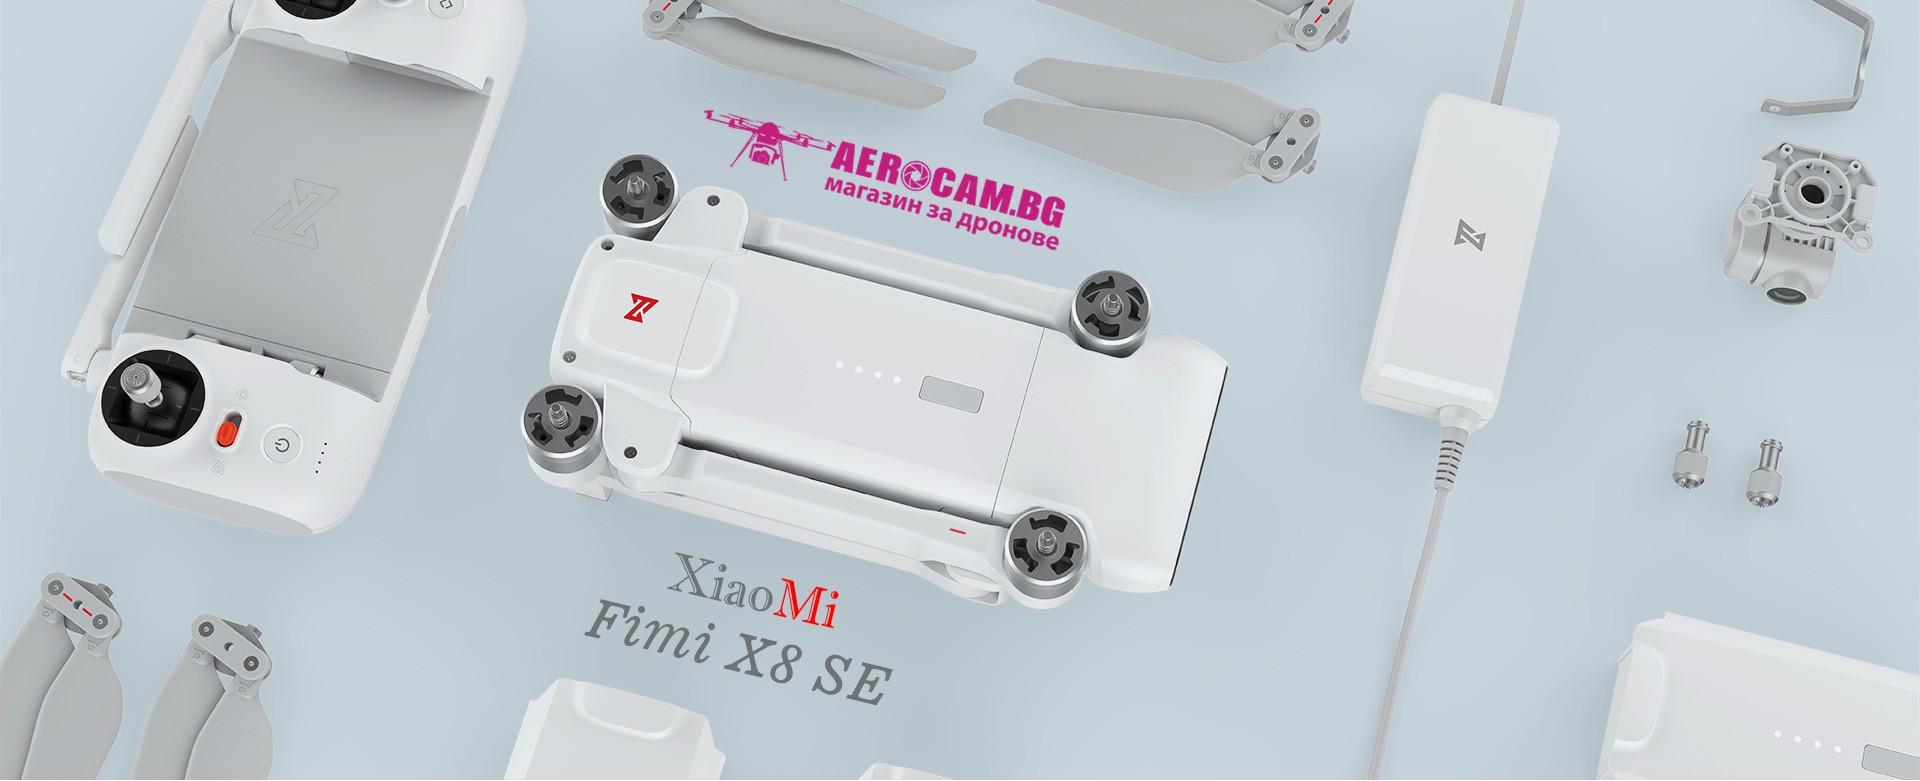 XiaoMI Fimi X8 SE from AeroCam.bg